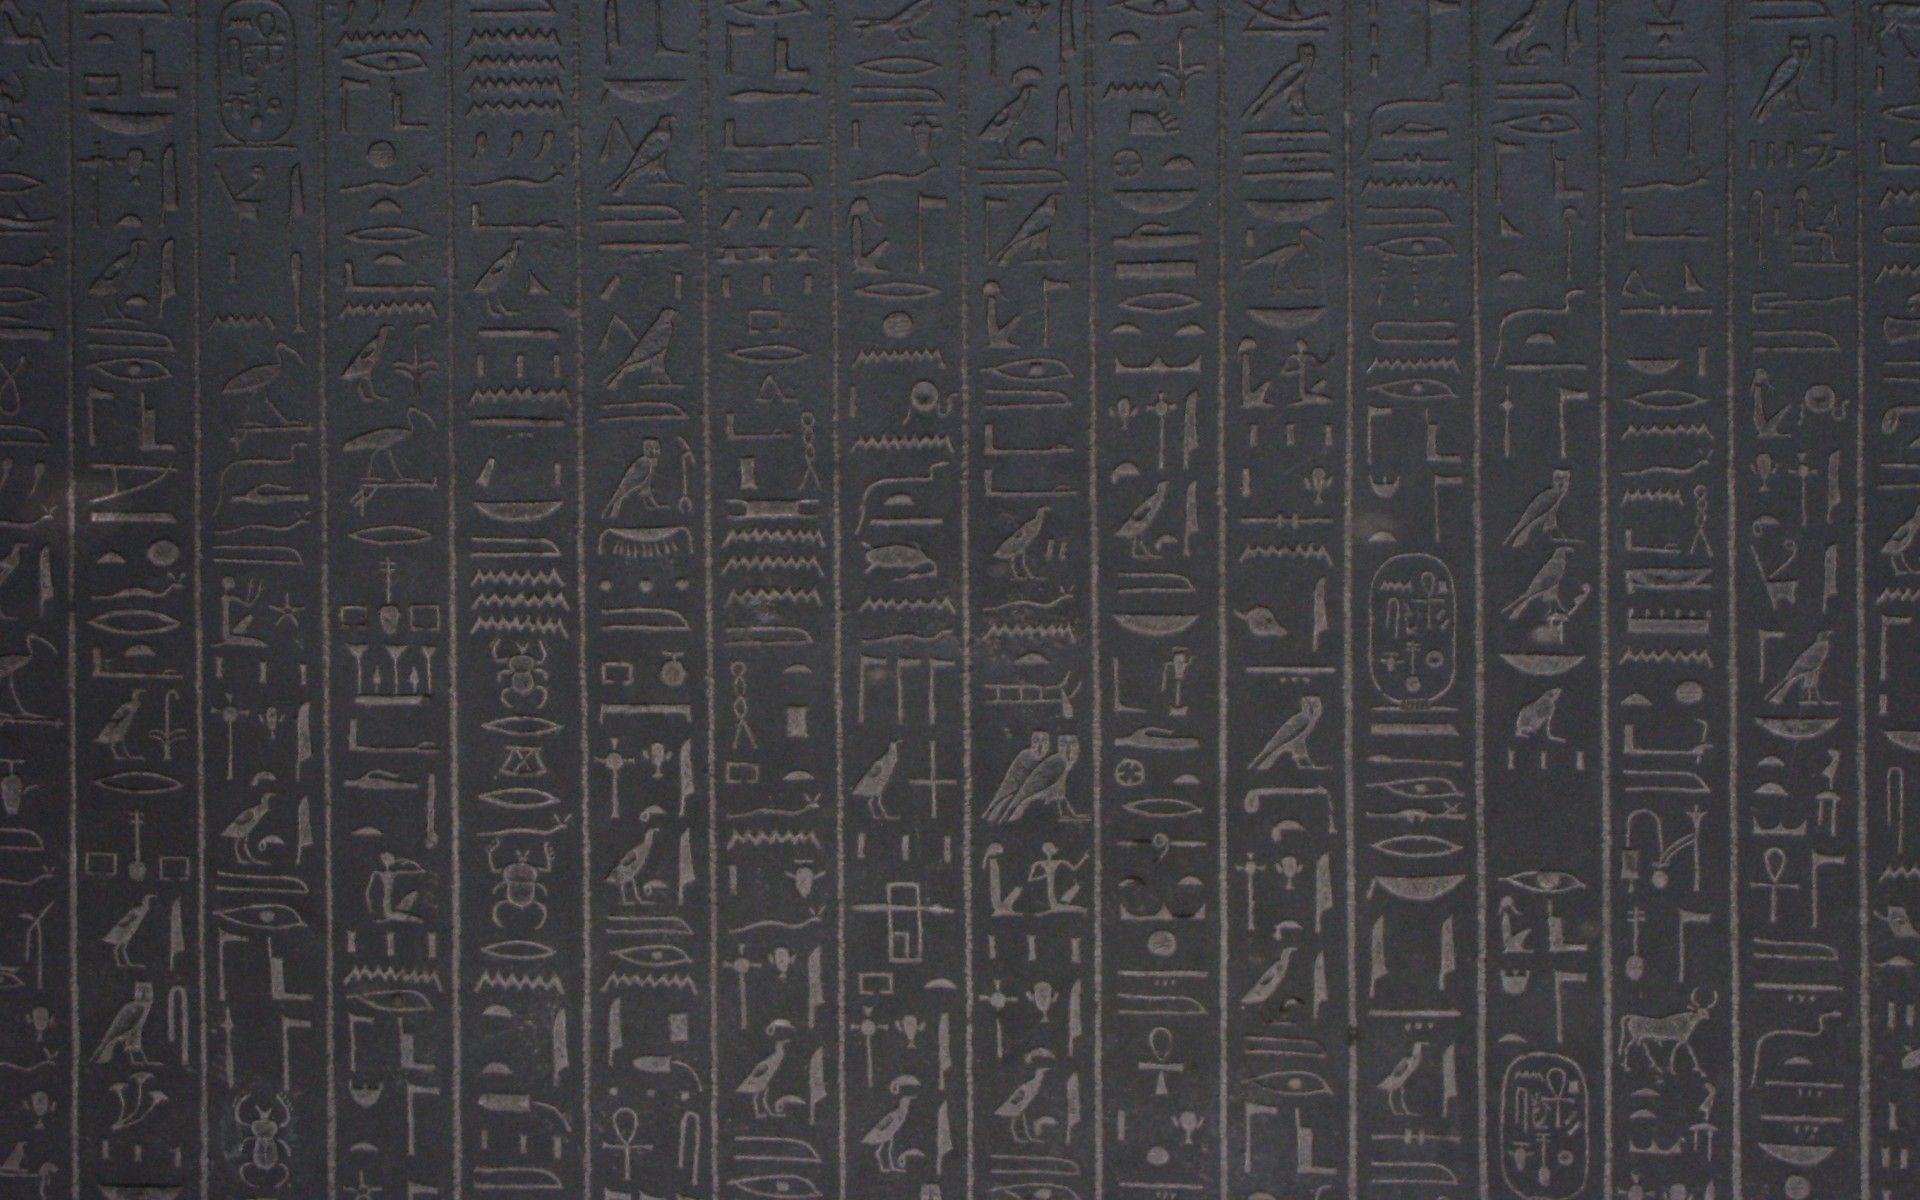 1920x1200 Egyptian Hieroglyphics Wallpaper Hd